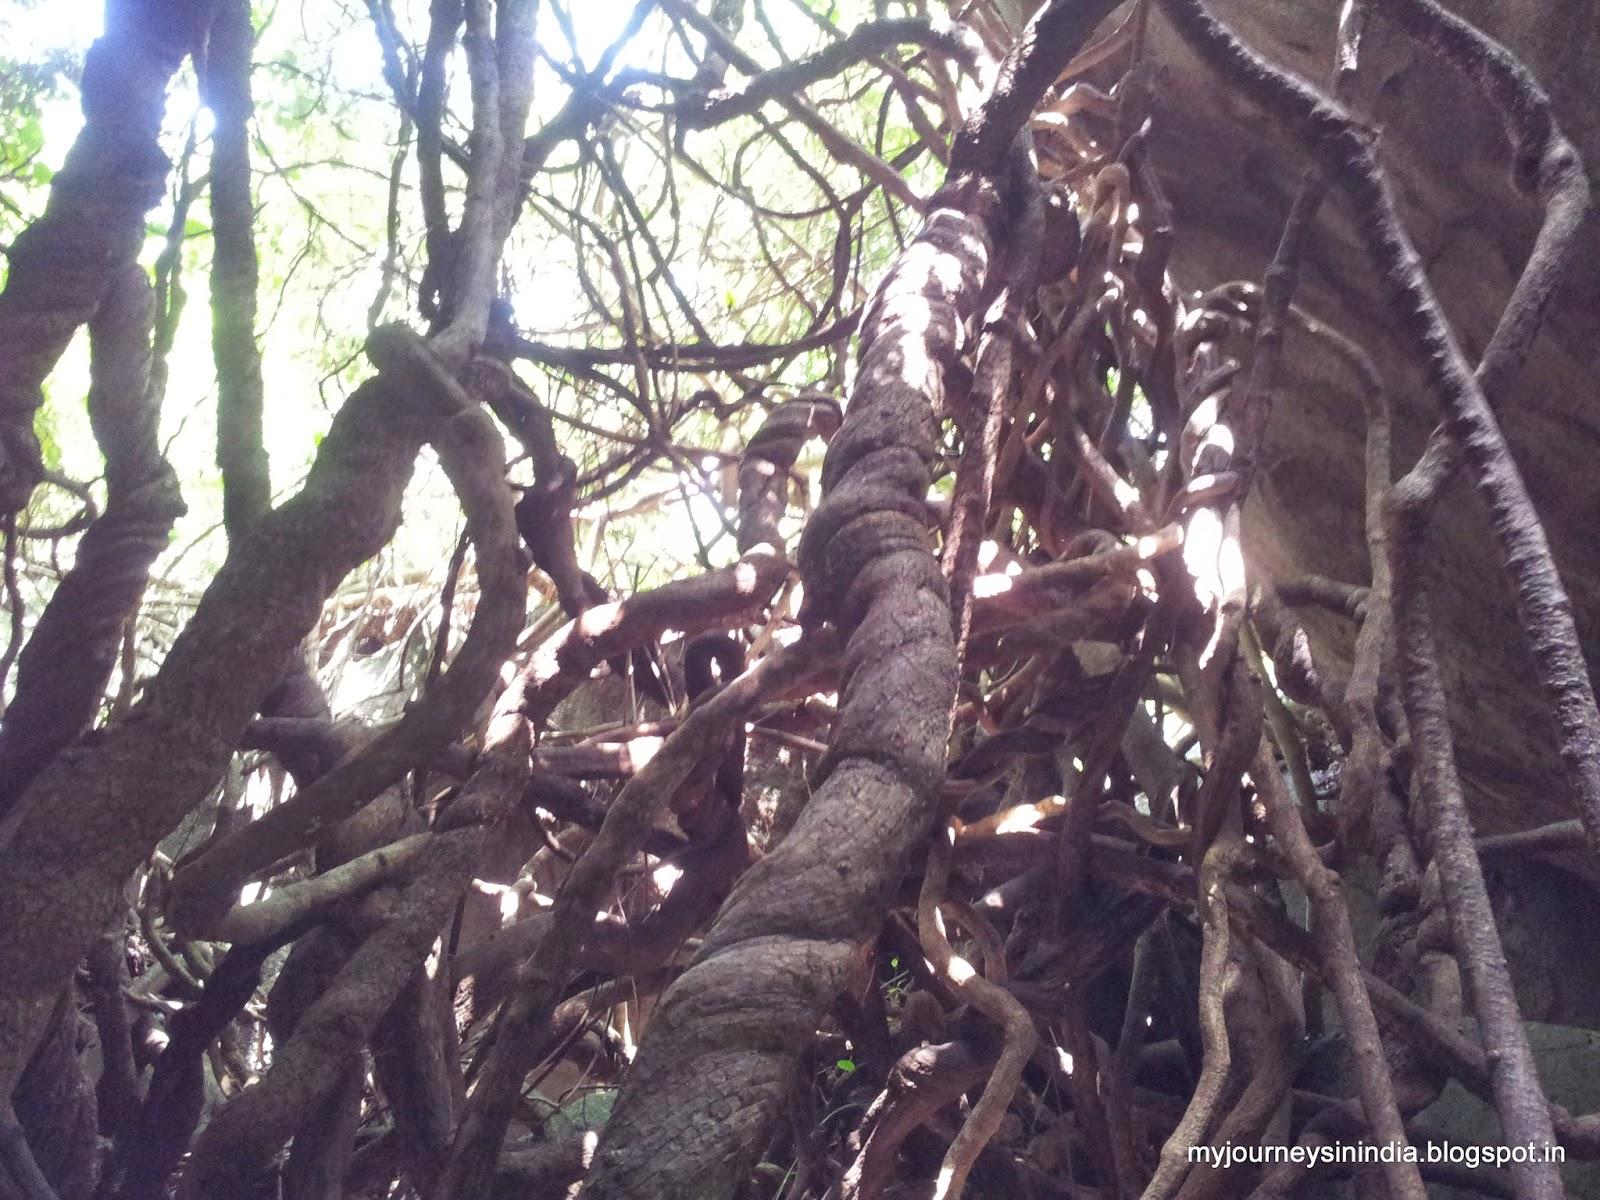 Trees growing on rocks - Siddarabetta